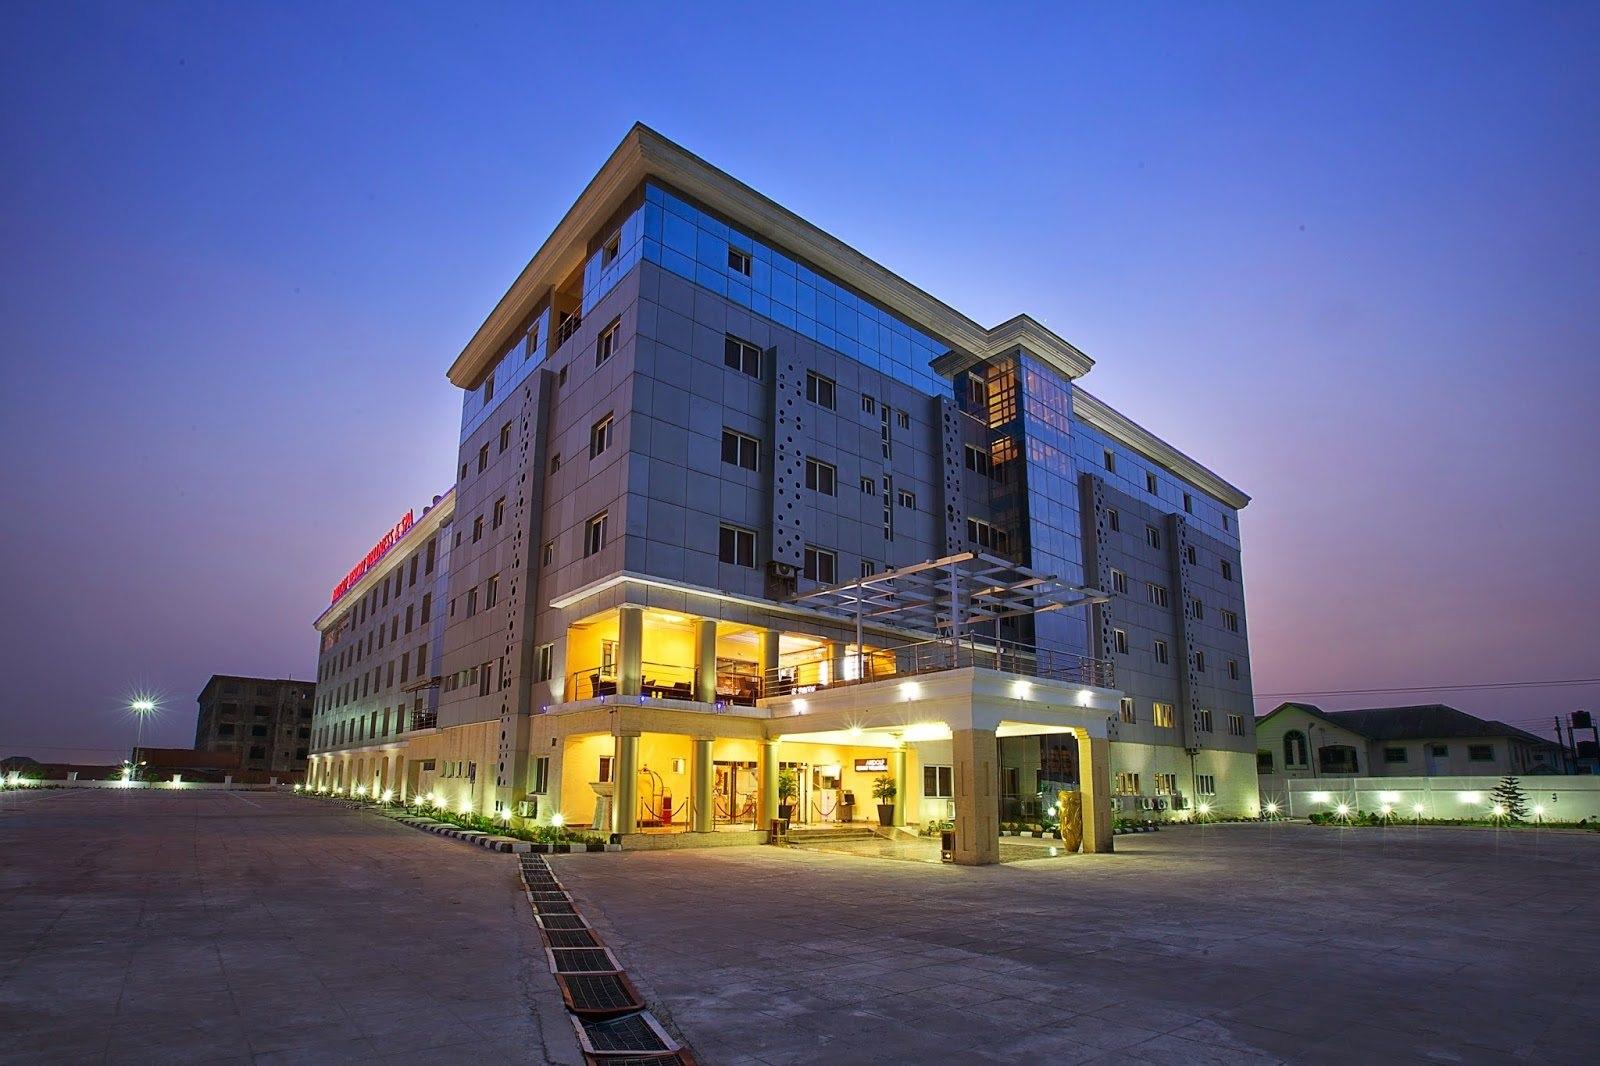 Inside patience jonathan s n10 billion aridolf resort for Wellness hotel